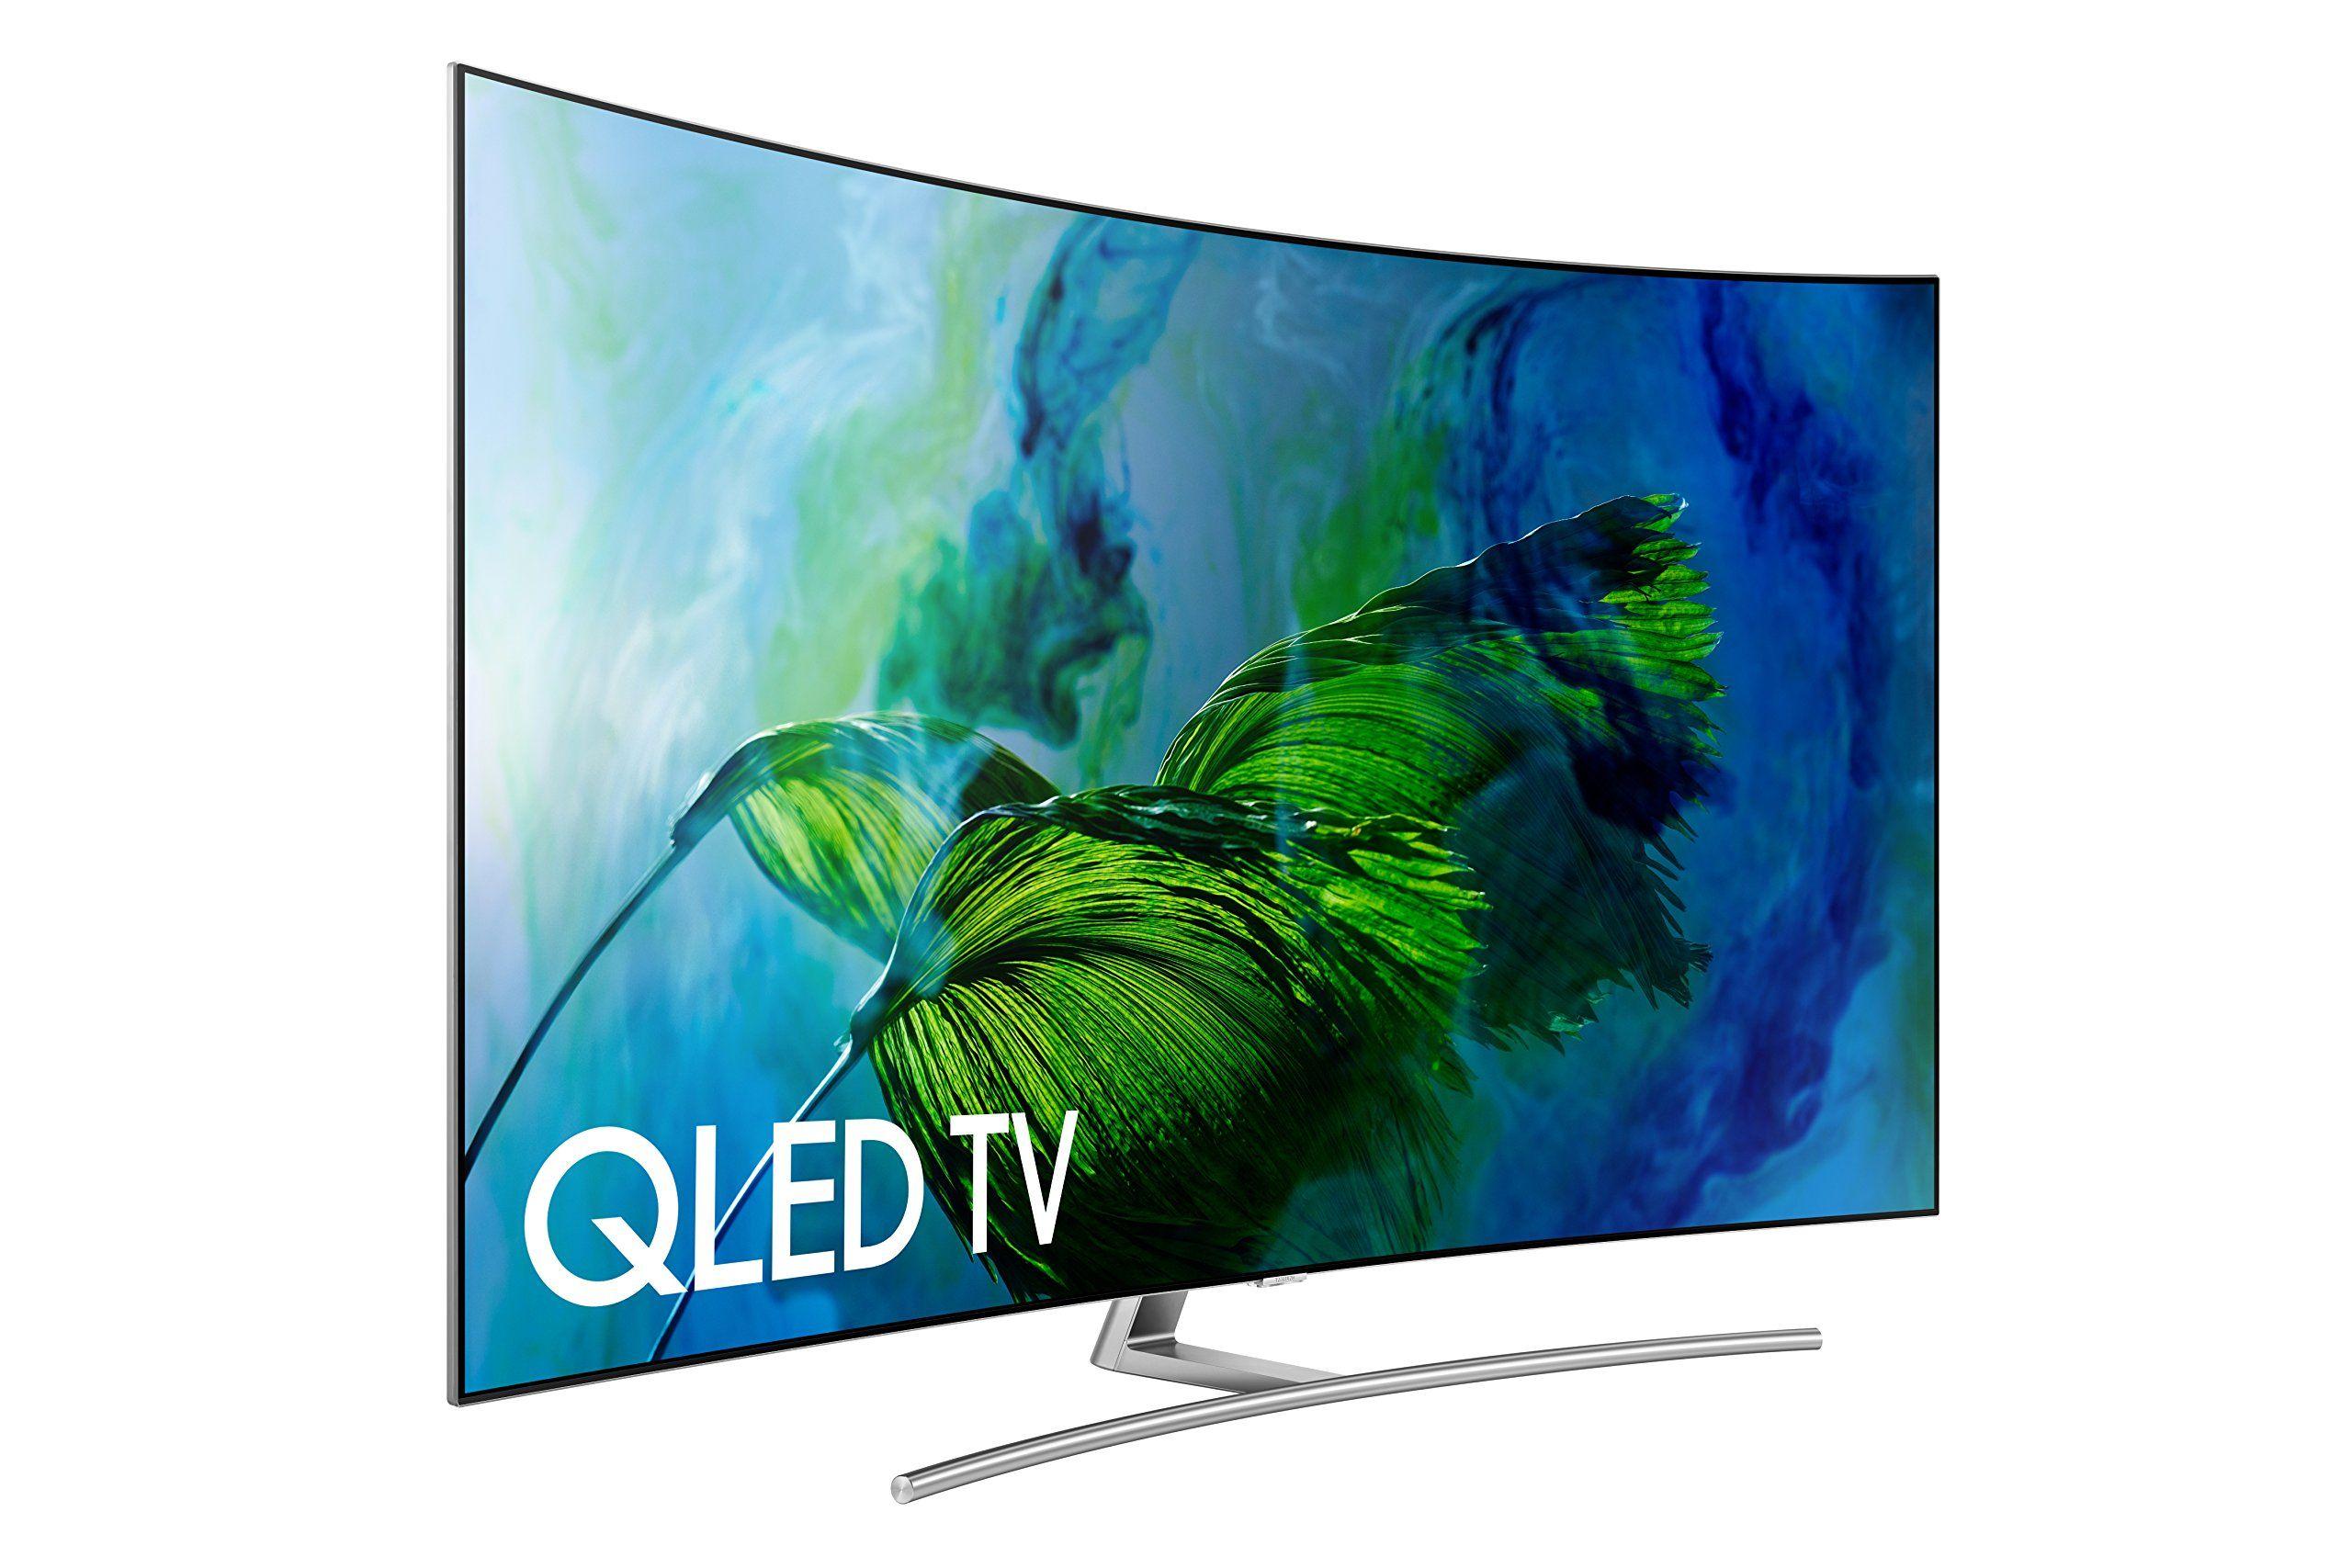 samsung qn65q8c curved 65-inch 4k ultra hd smart qled tv (2017